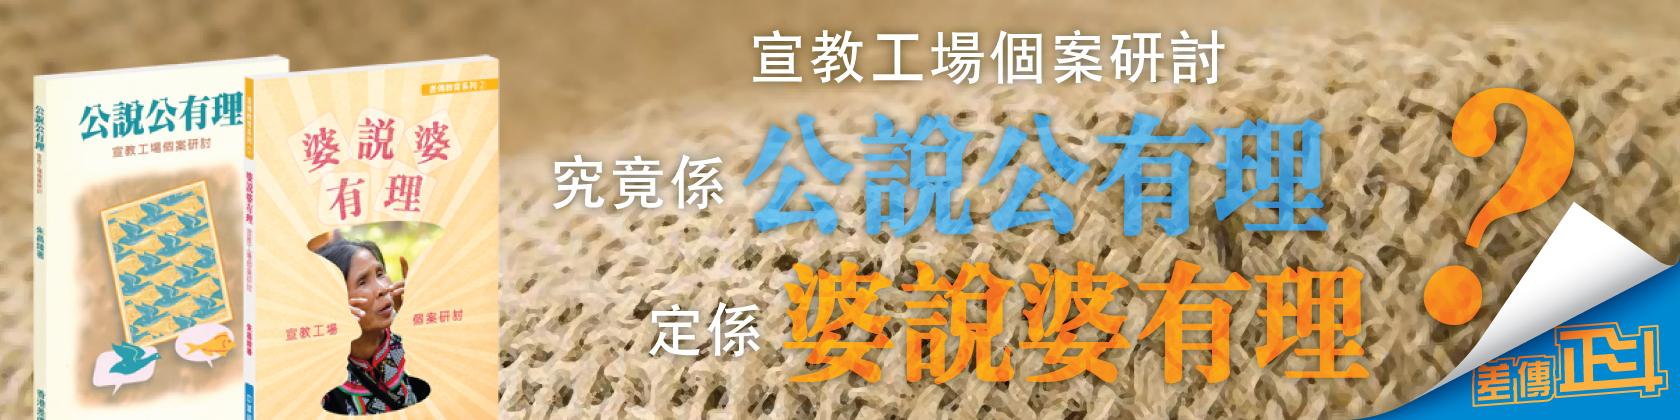 CB-01-web-banner-1680-x-420-B2-03